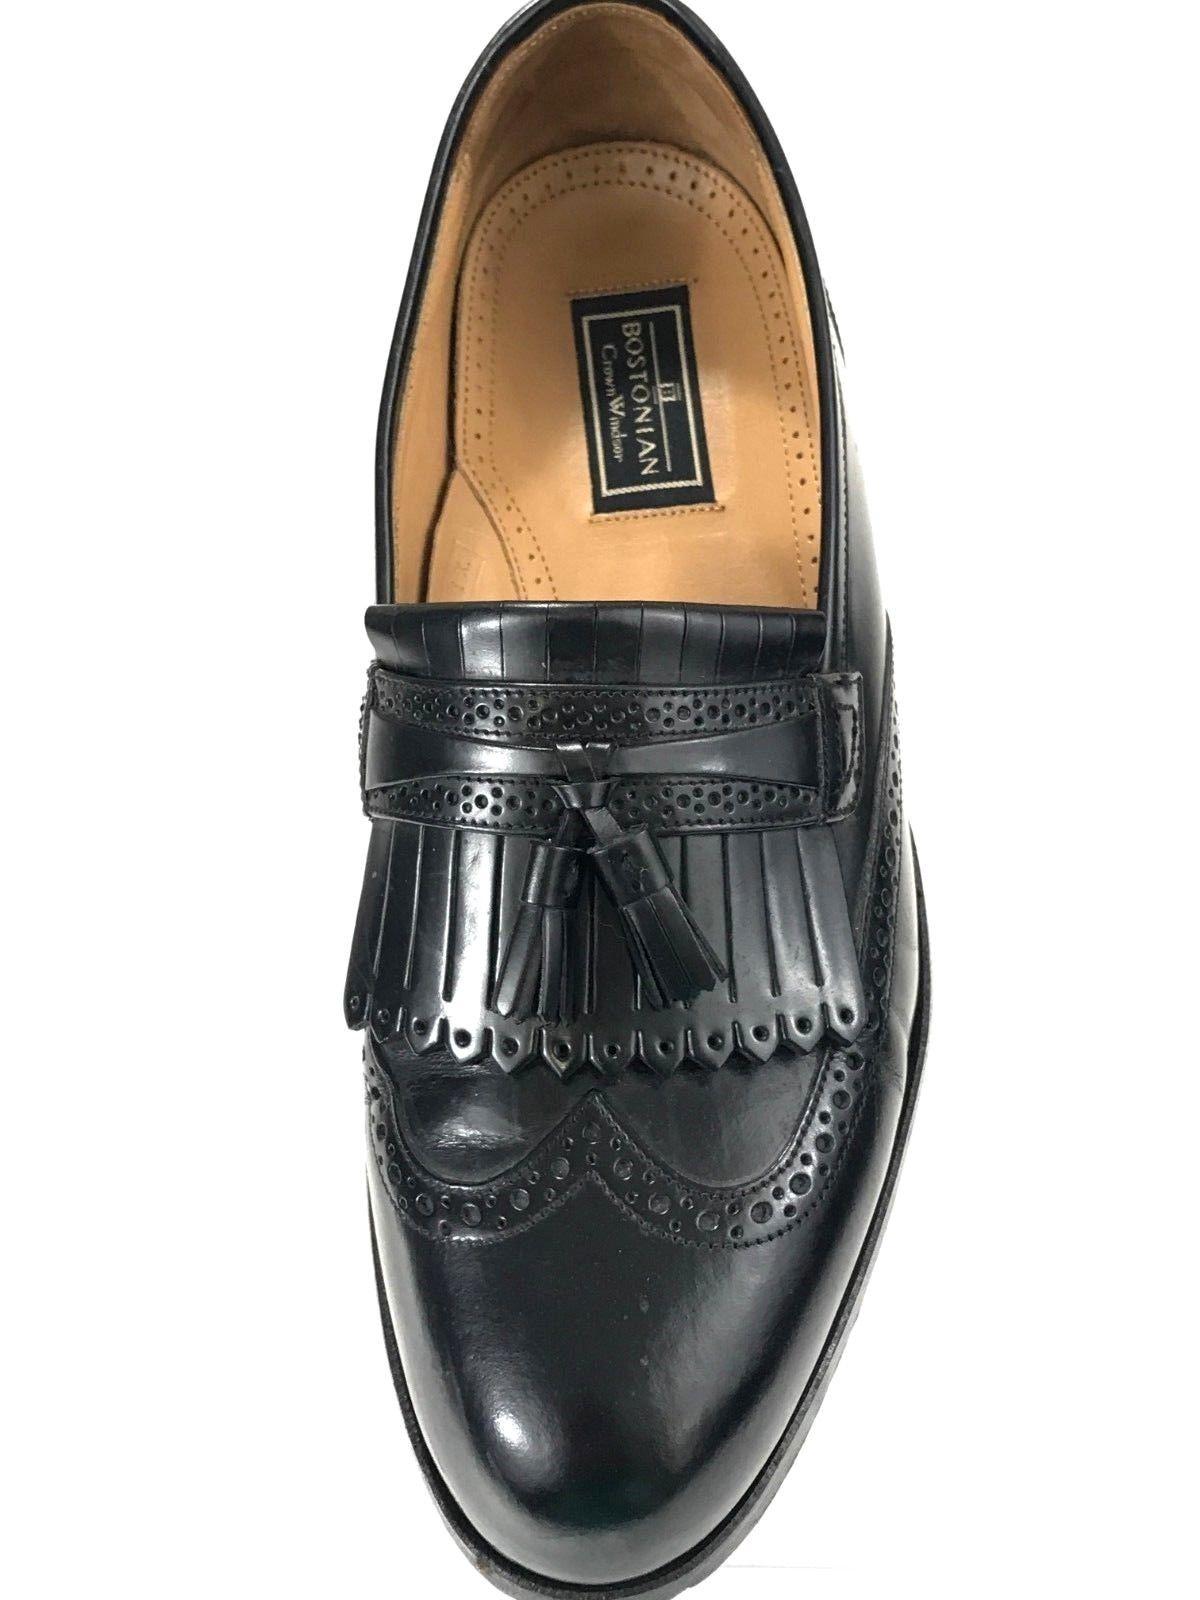 3c9eecb7e1a Bostonian Crown Windsor Men s Black Loafer Size 9.5 D